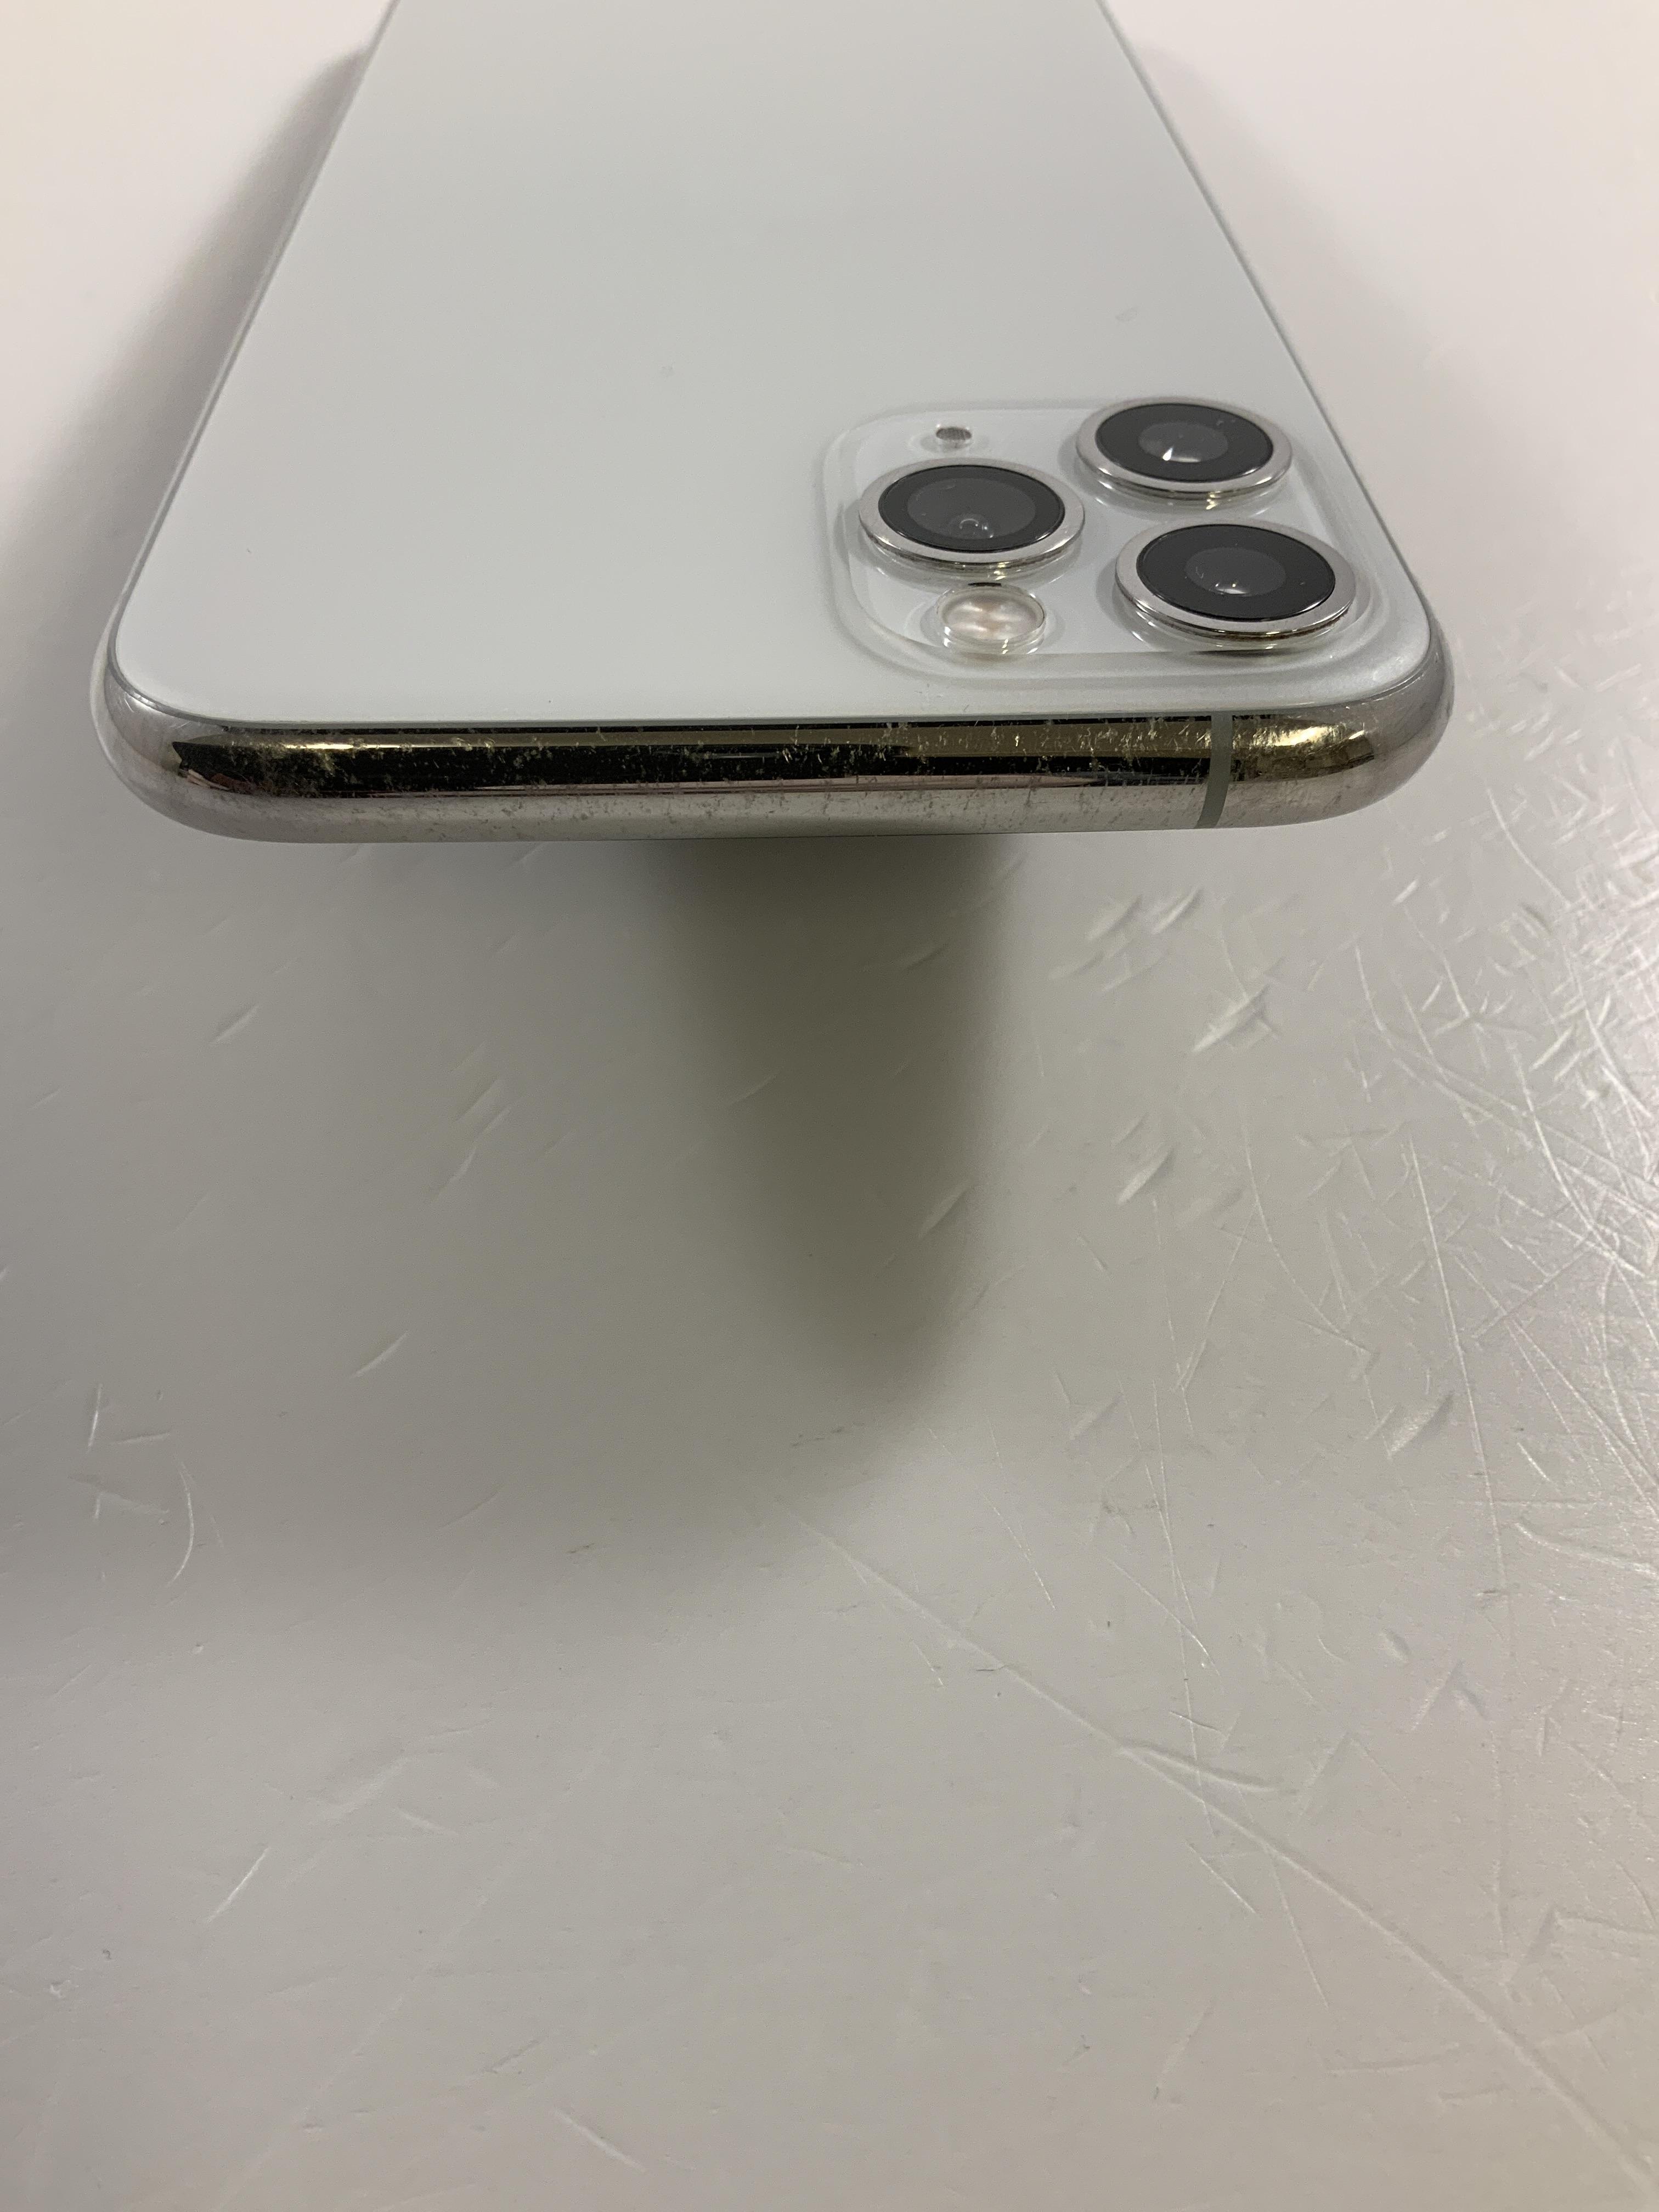 iPhone 11 Pro 64GB, 64GB, Silver, image 4